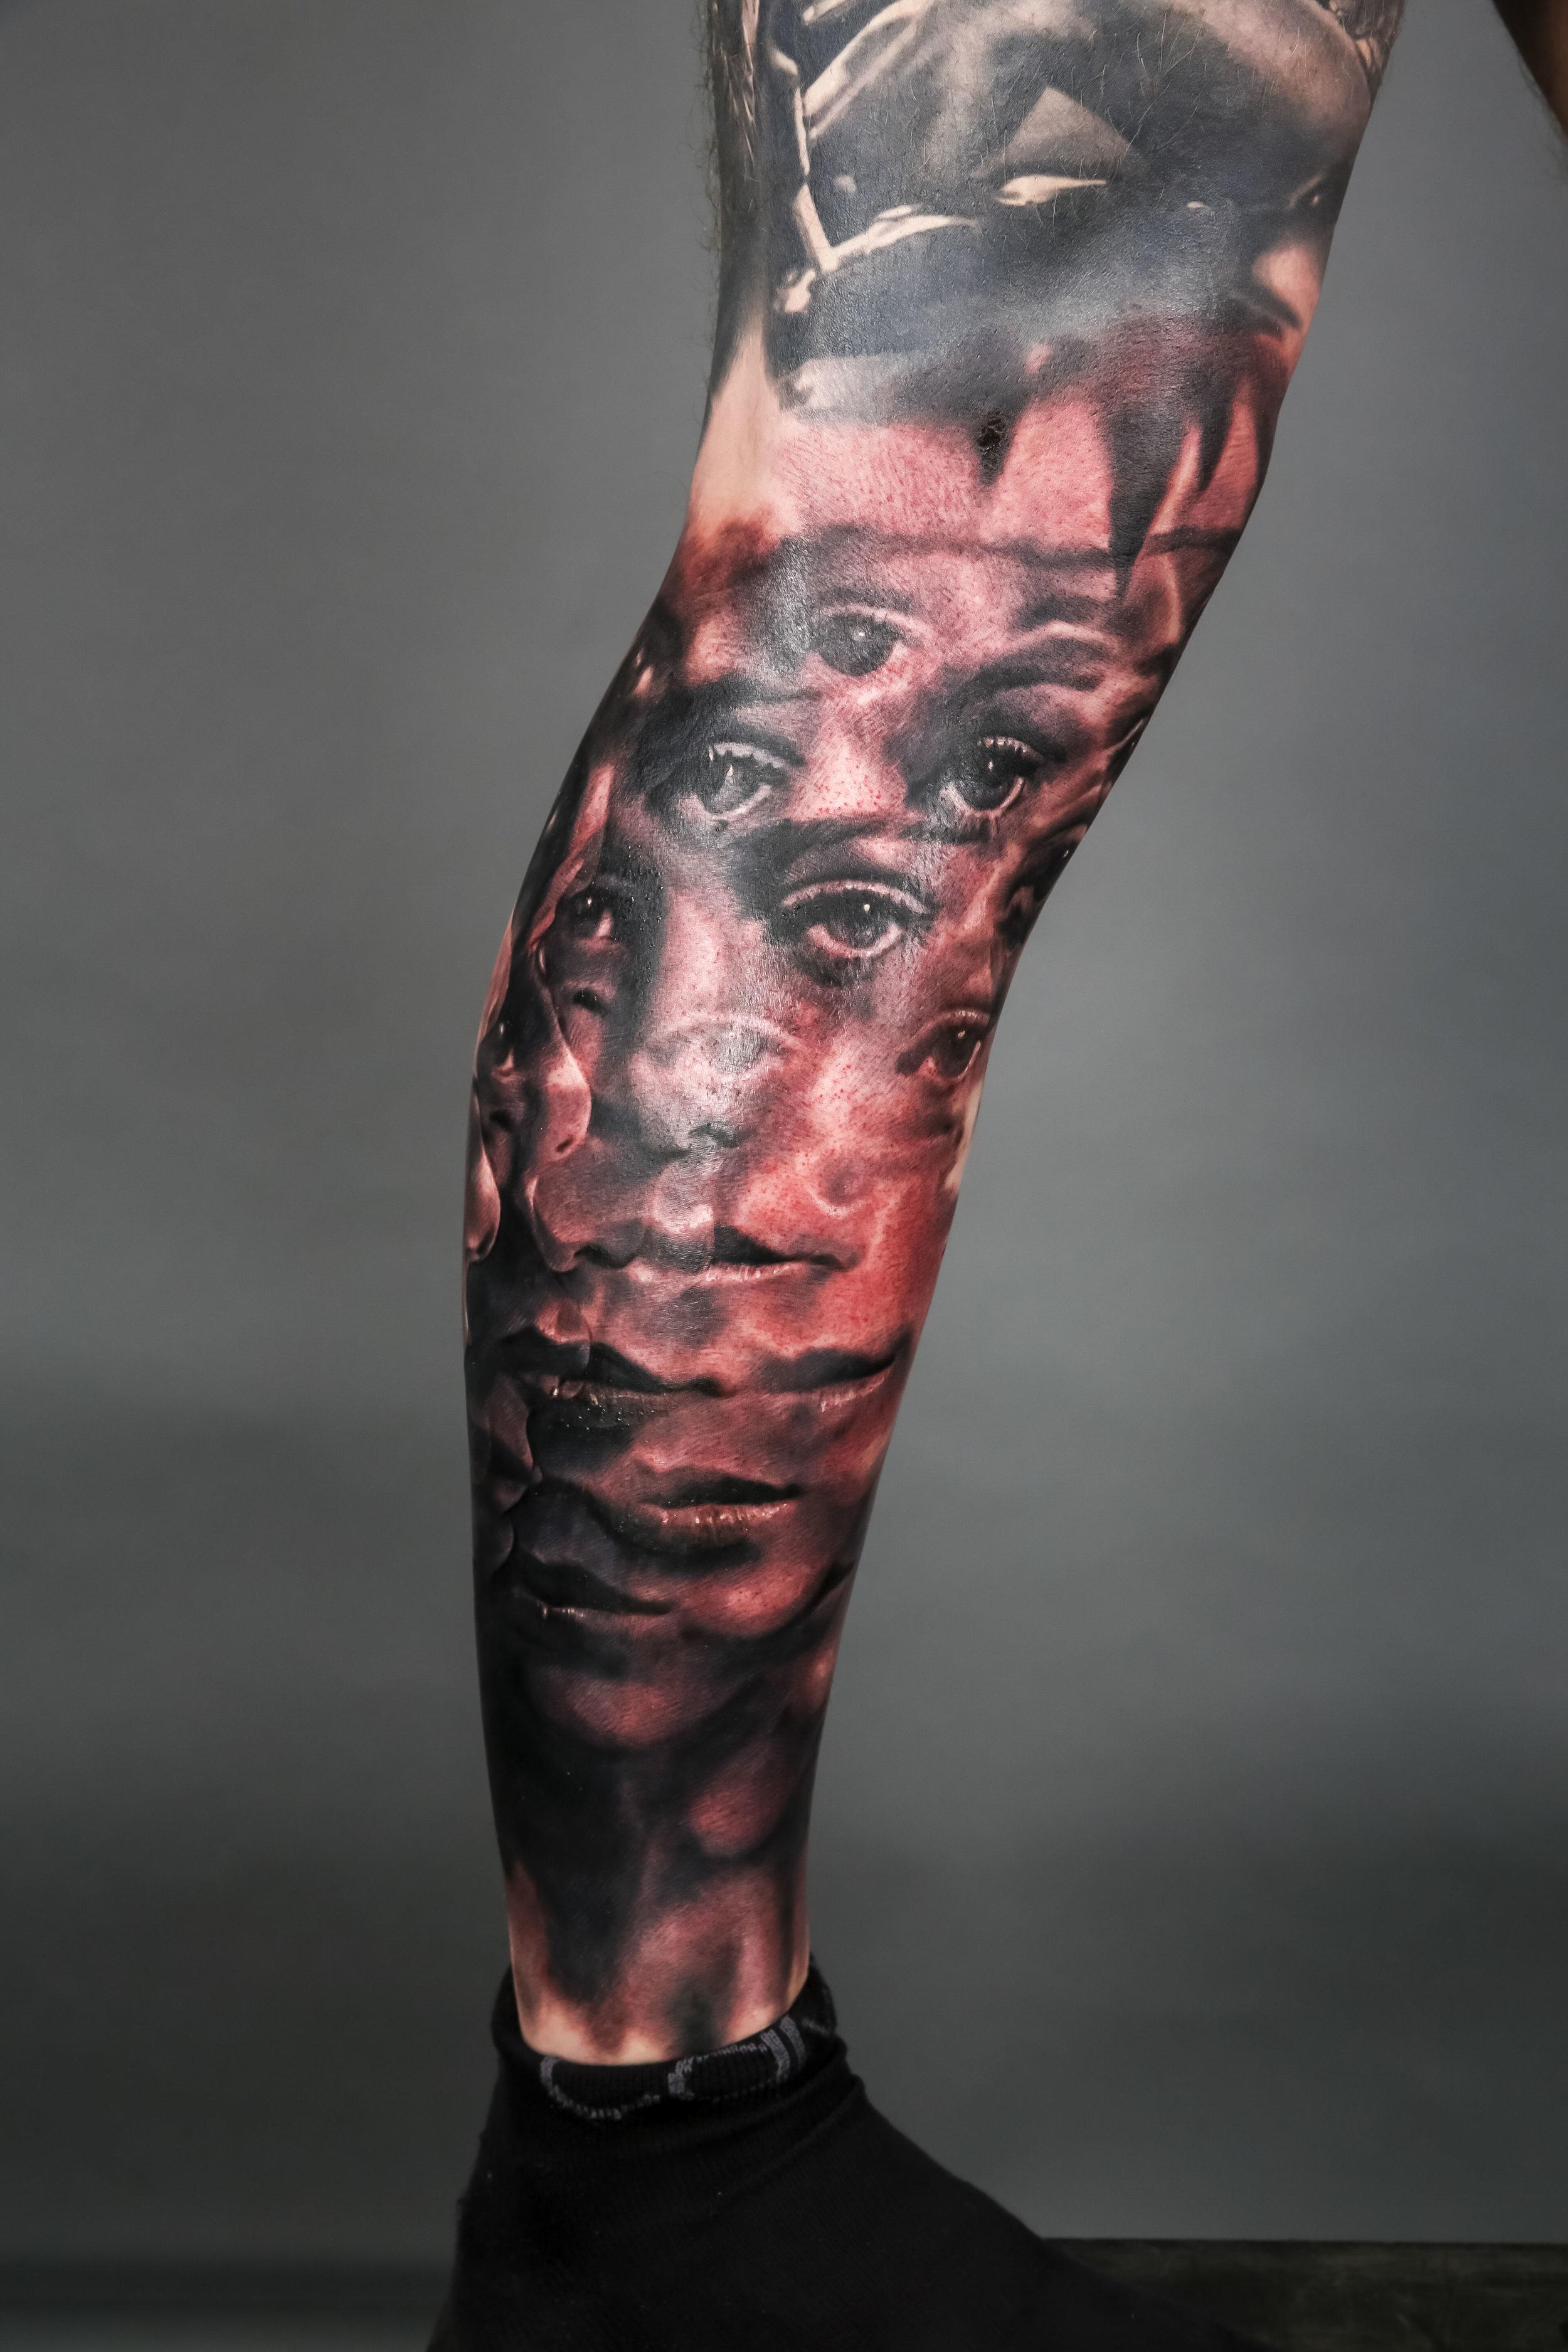 Winner Black & Grey and Best of Sunday by Zmetek of Jarda Tattoo